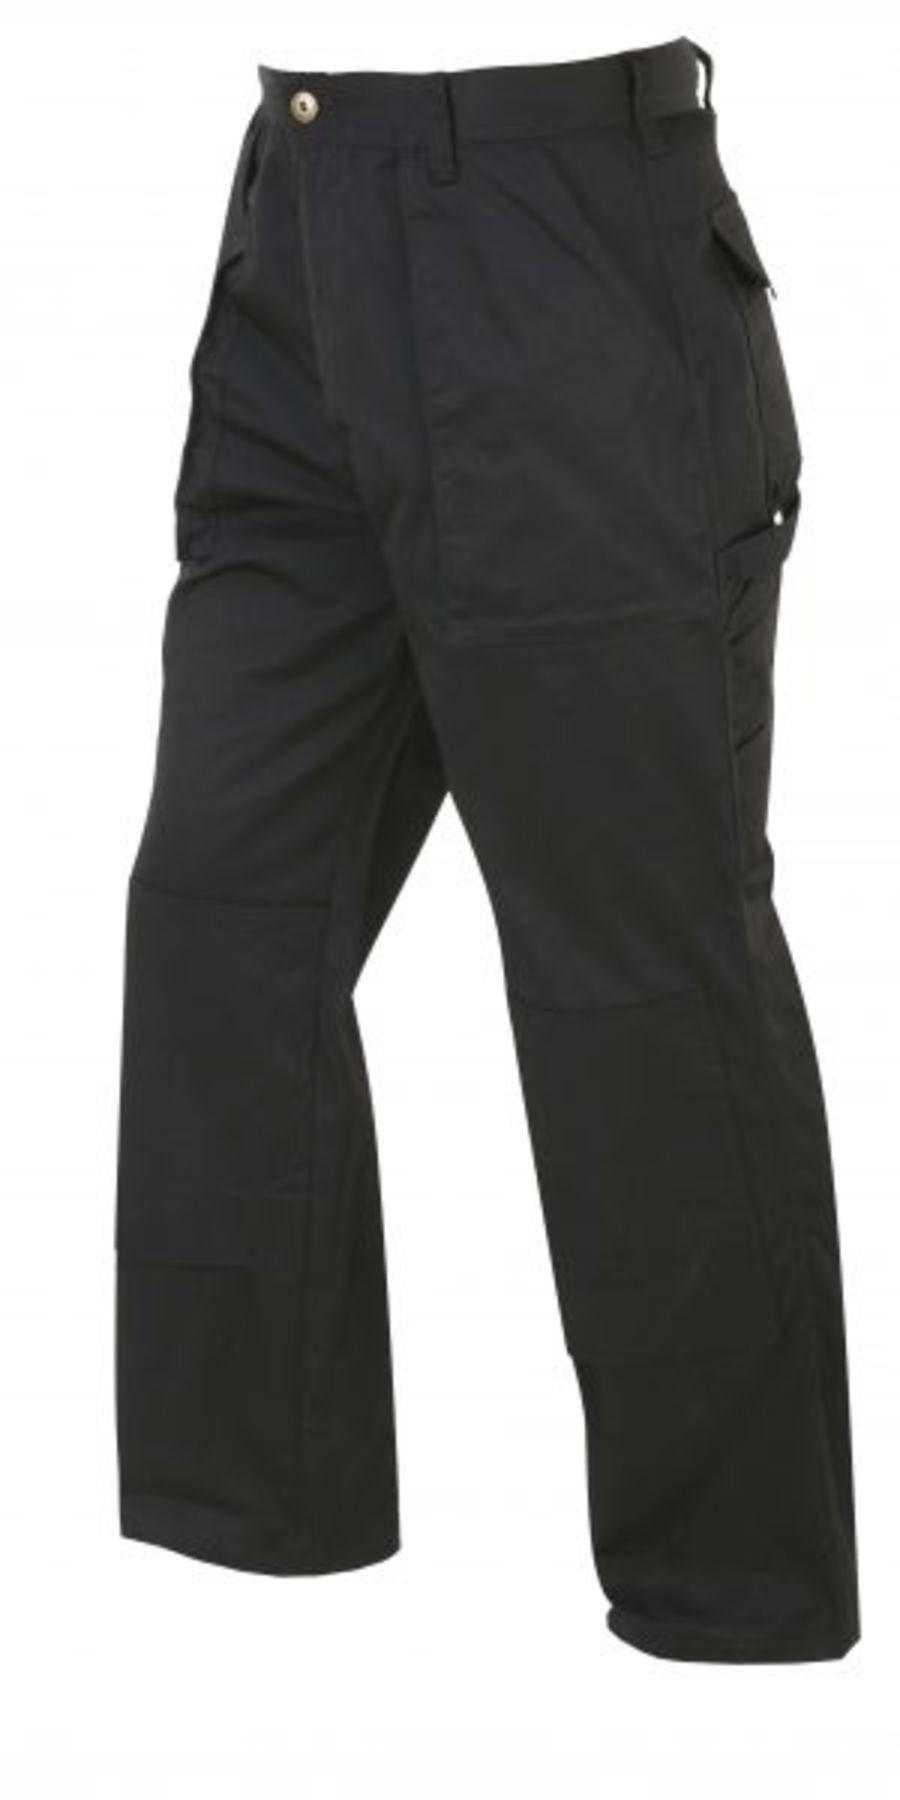 Lee Cooper Cargo Pant